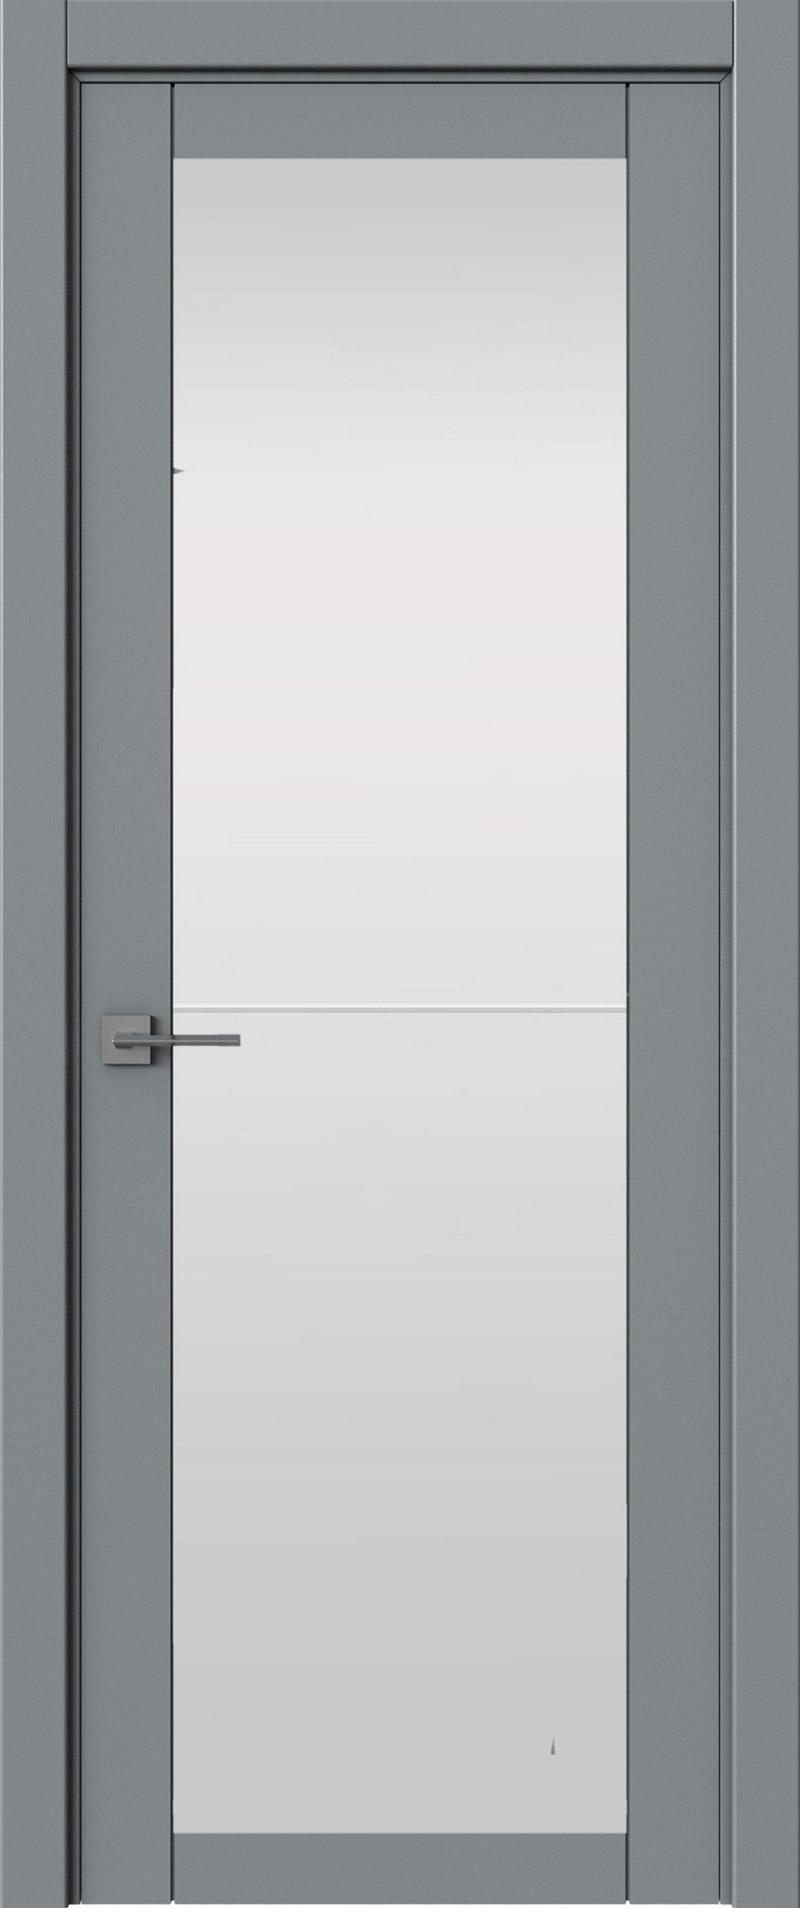 Tivoli З-2 цвет - Серебристо-серая эмаль (RAL 7045) Со стеклом (ДО)